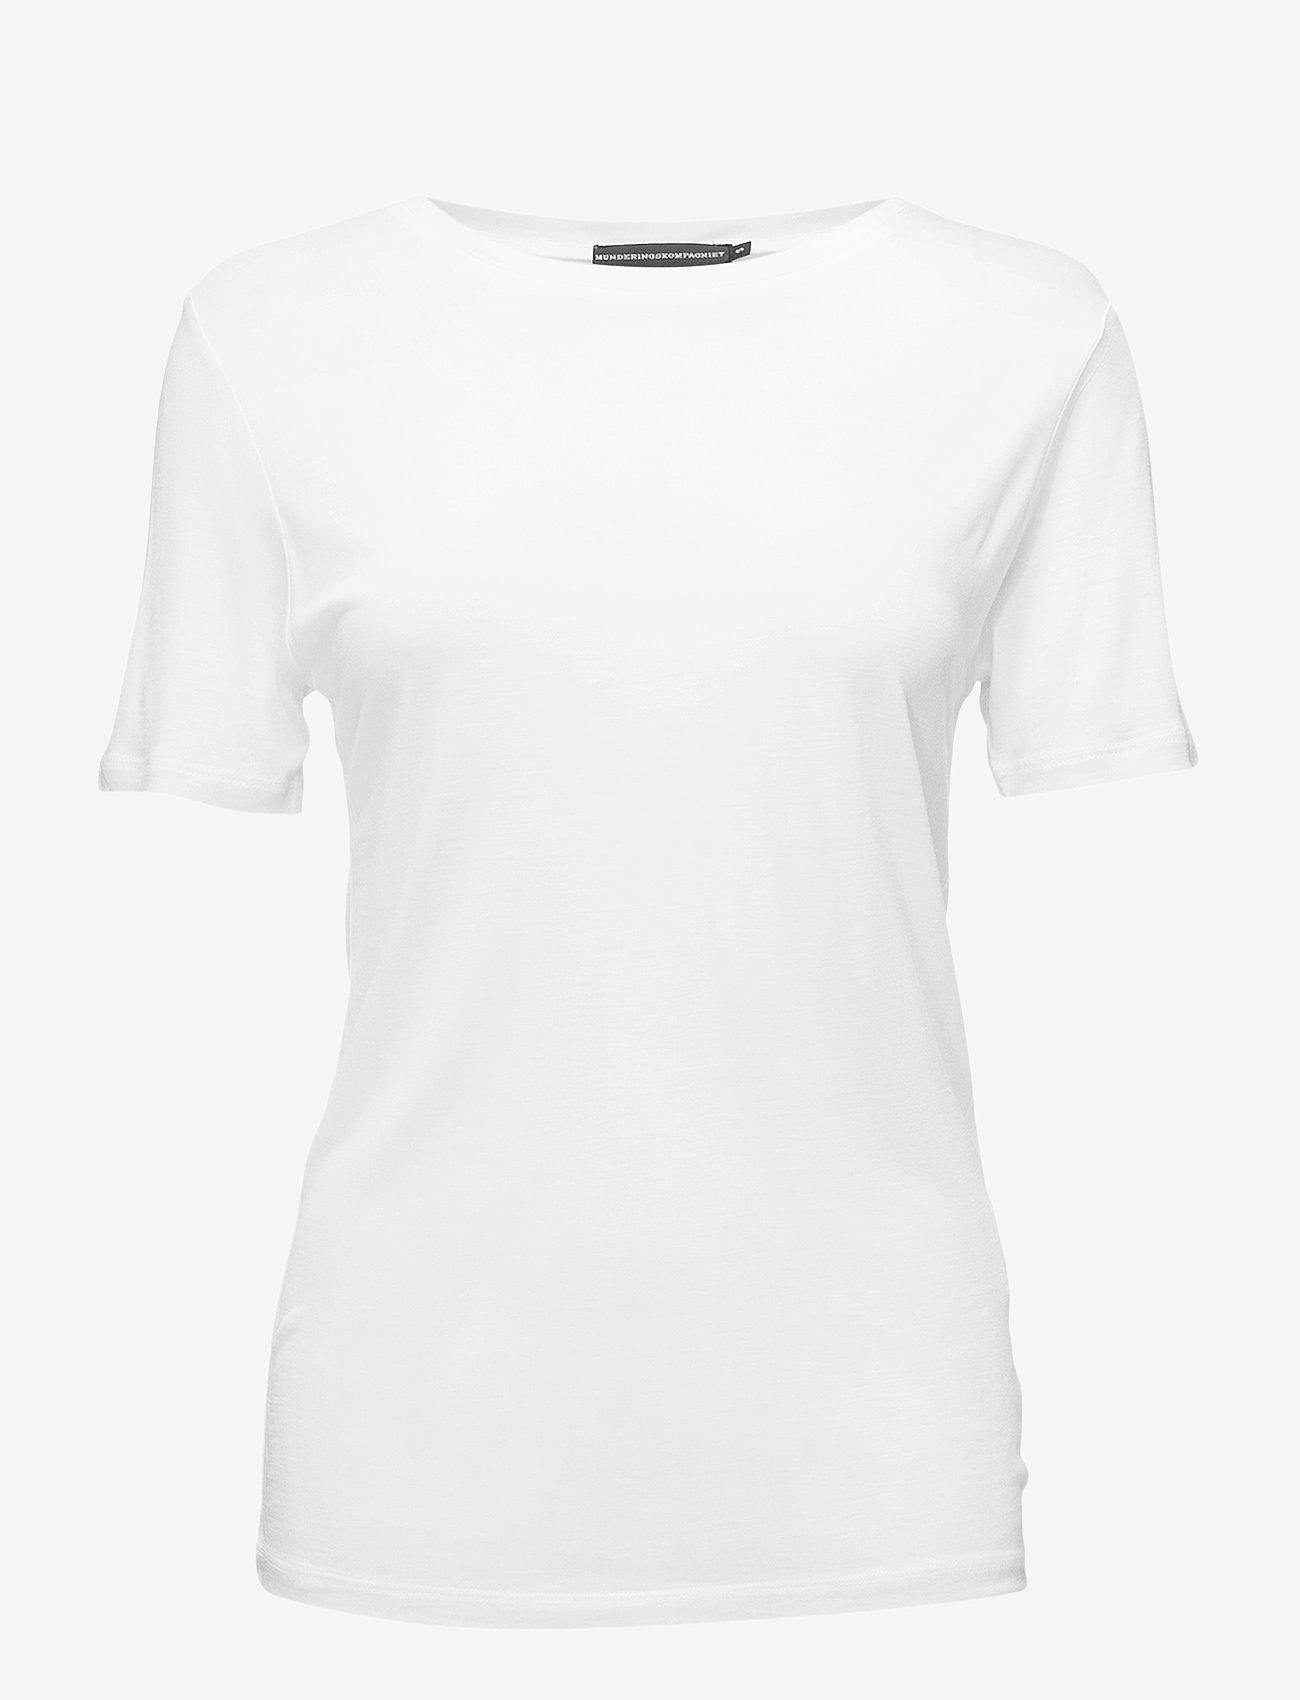 MDK / Munderingskompagniet - Mdk t-shirt - t-shirts - white - 0